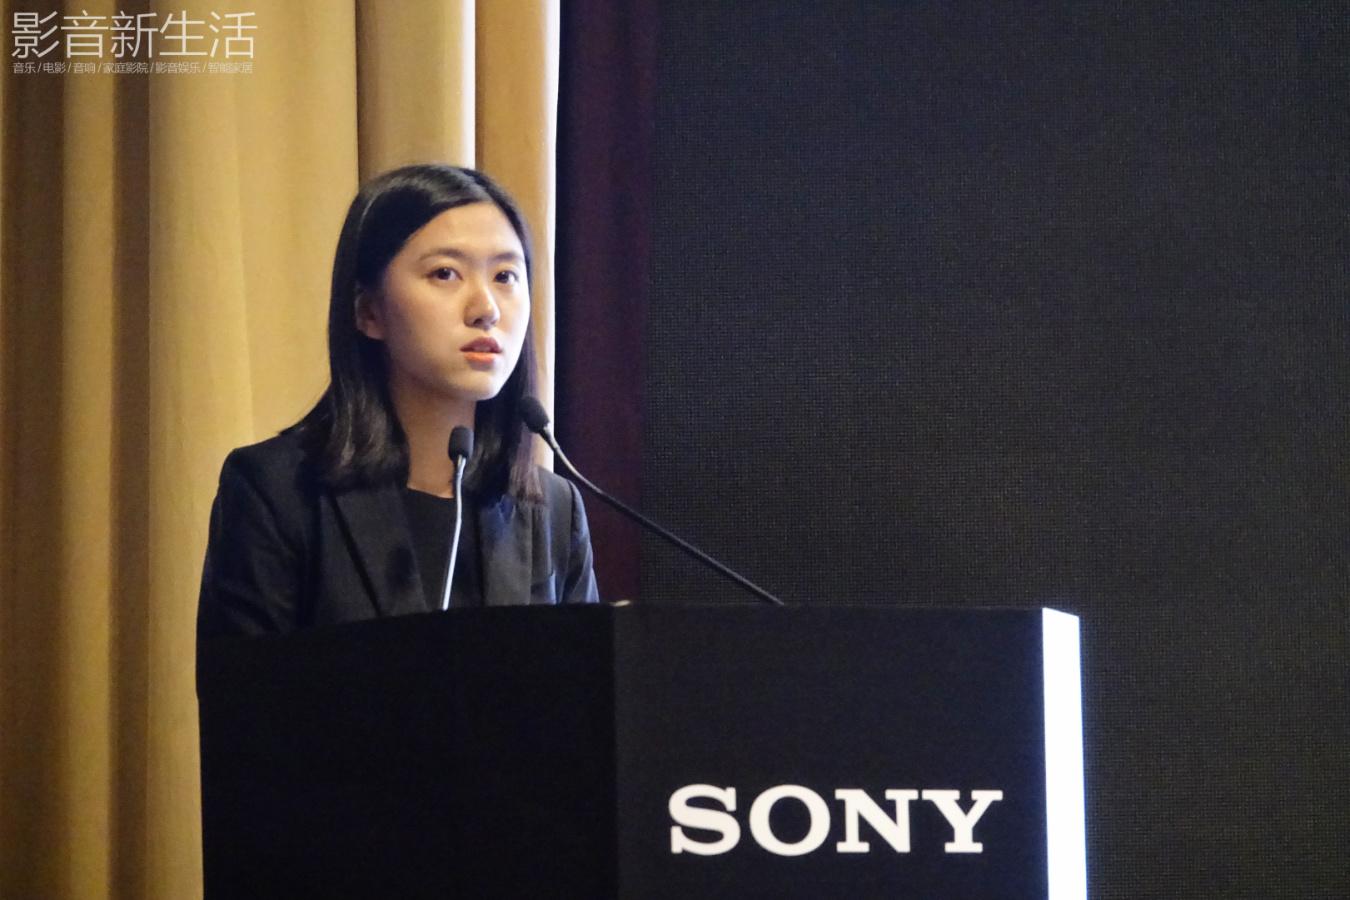 "Sony Hi Res 2018 32 - 新品 | ""重塑随身音乐娱乐王朝!"":Sony索尼发布Signature醇音系列新兄弟IER-Z1R和DMP-Z1,以及舞台监听耳机系列:IER-M7和IER-M9,还有升级款MDR-Z7M2!"